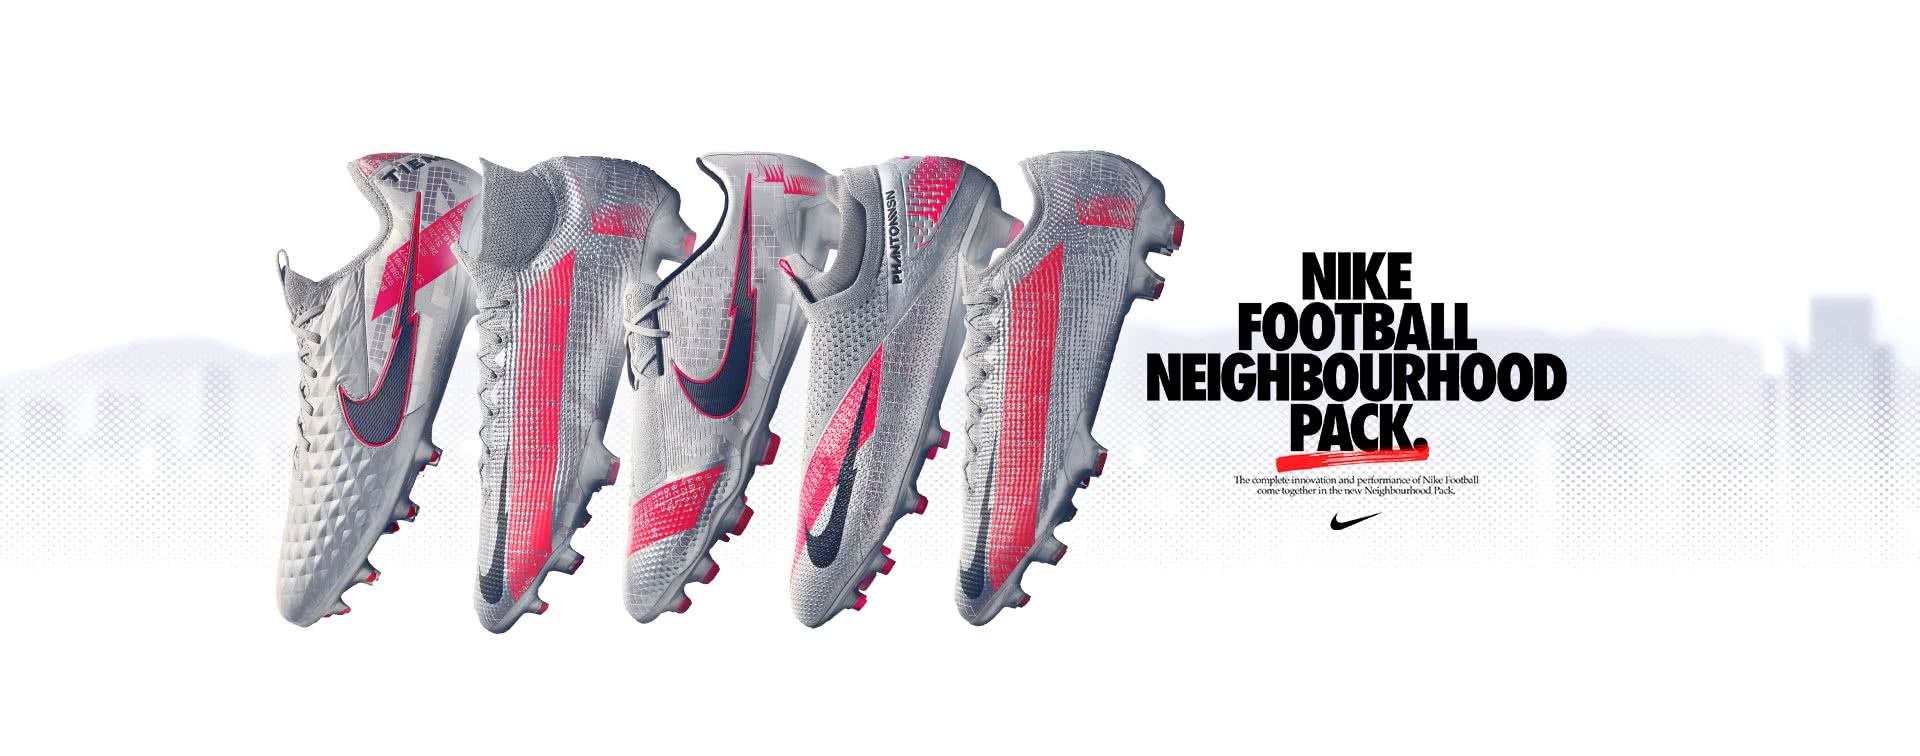 nouveaux crampons Nike Neighbourhood pack